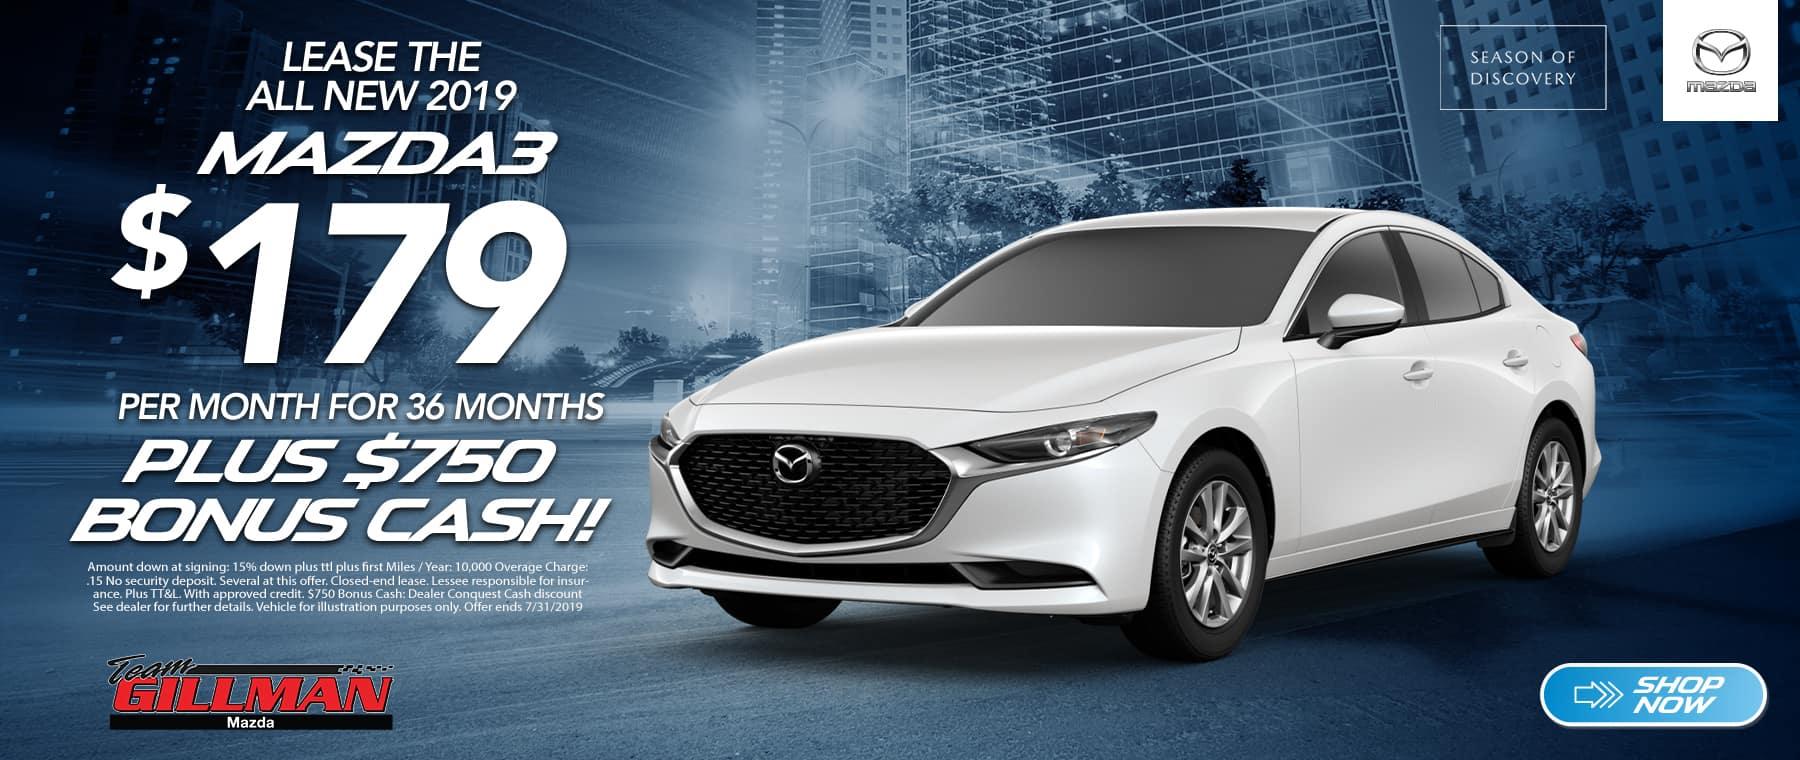 Car Lots In Houston >> Team Gillman Mazda North Houston Mazda Dealership Formerly Munday